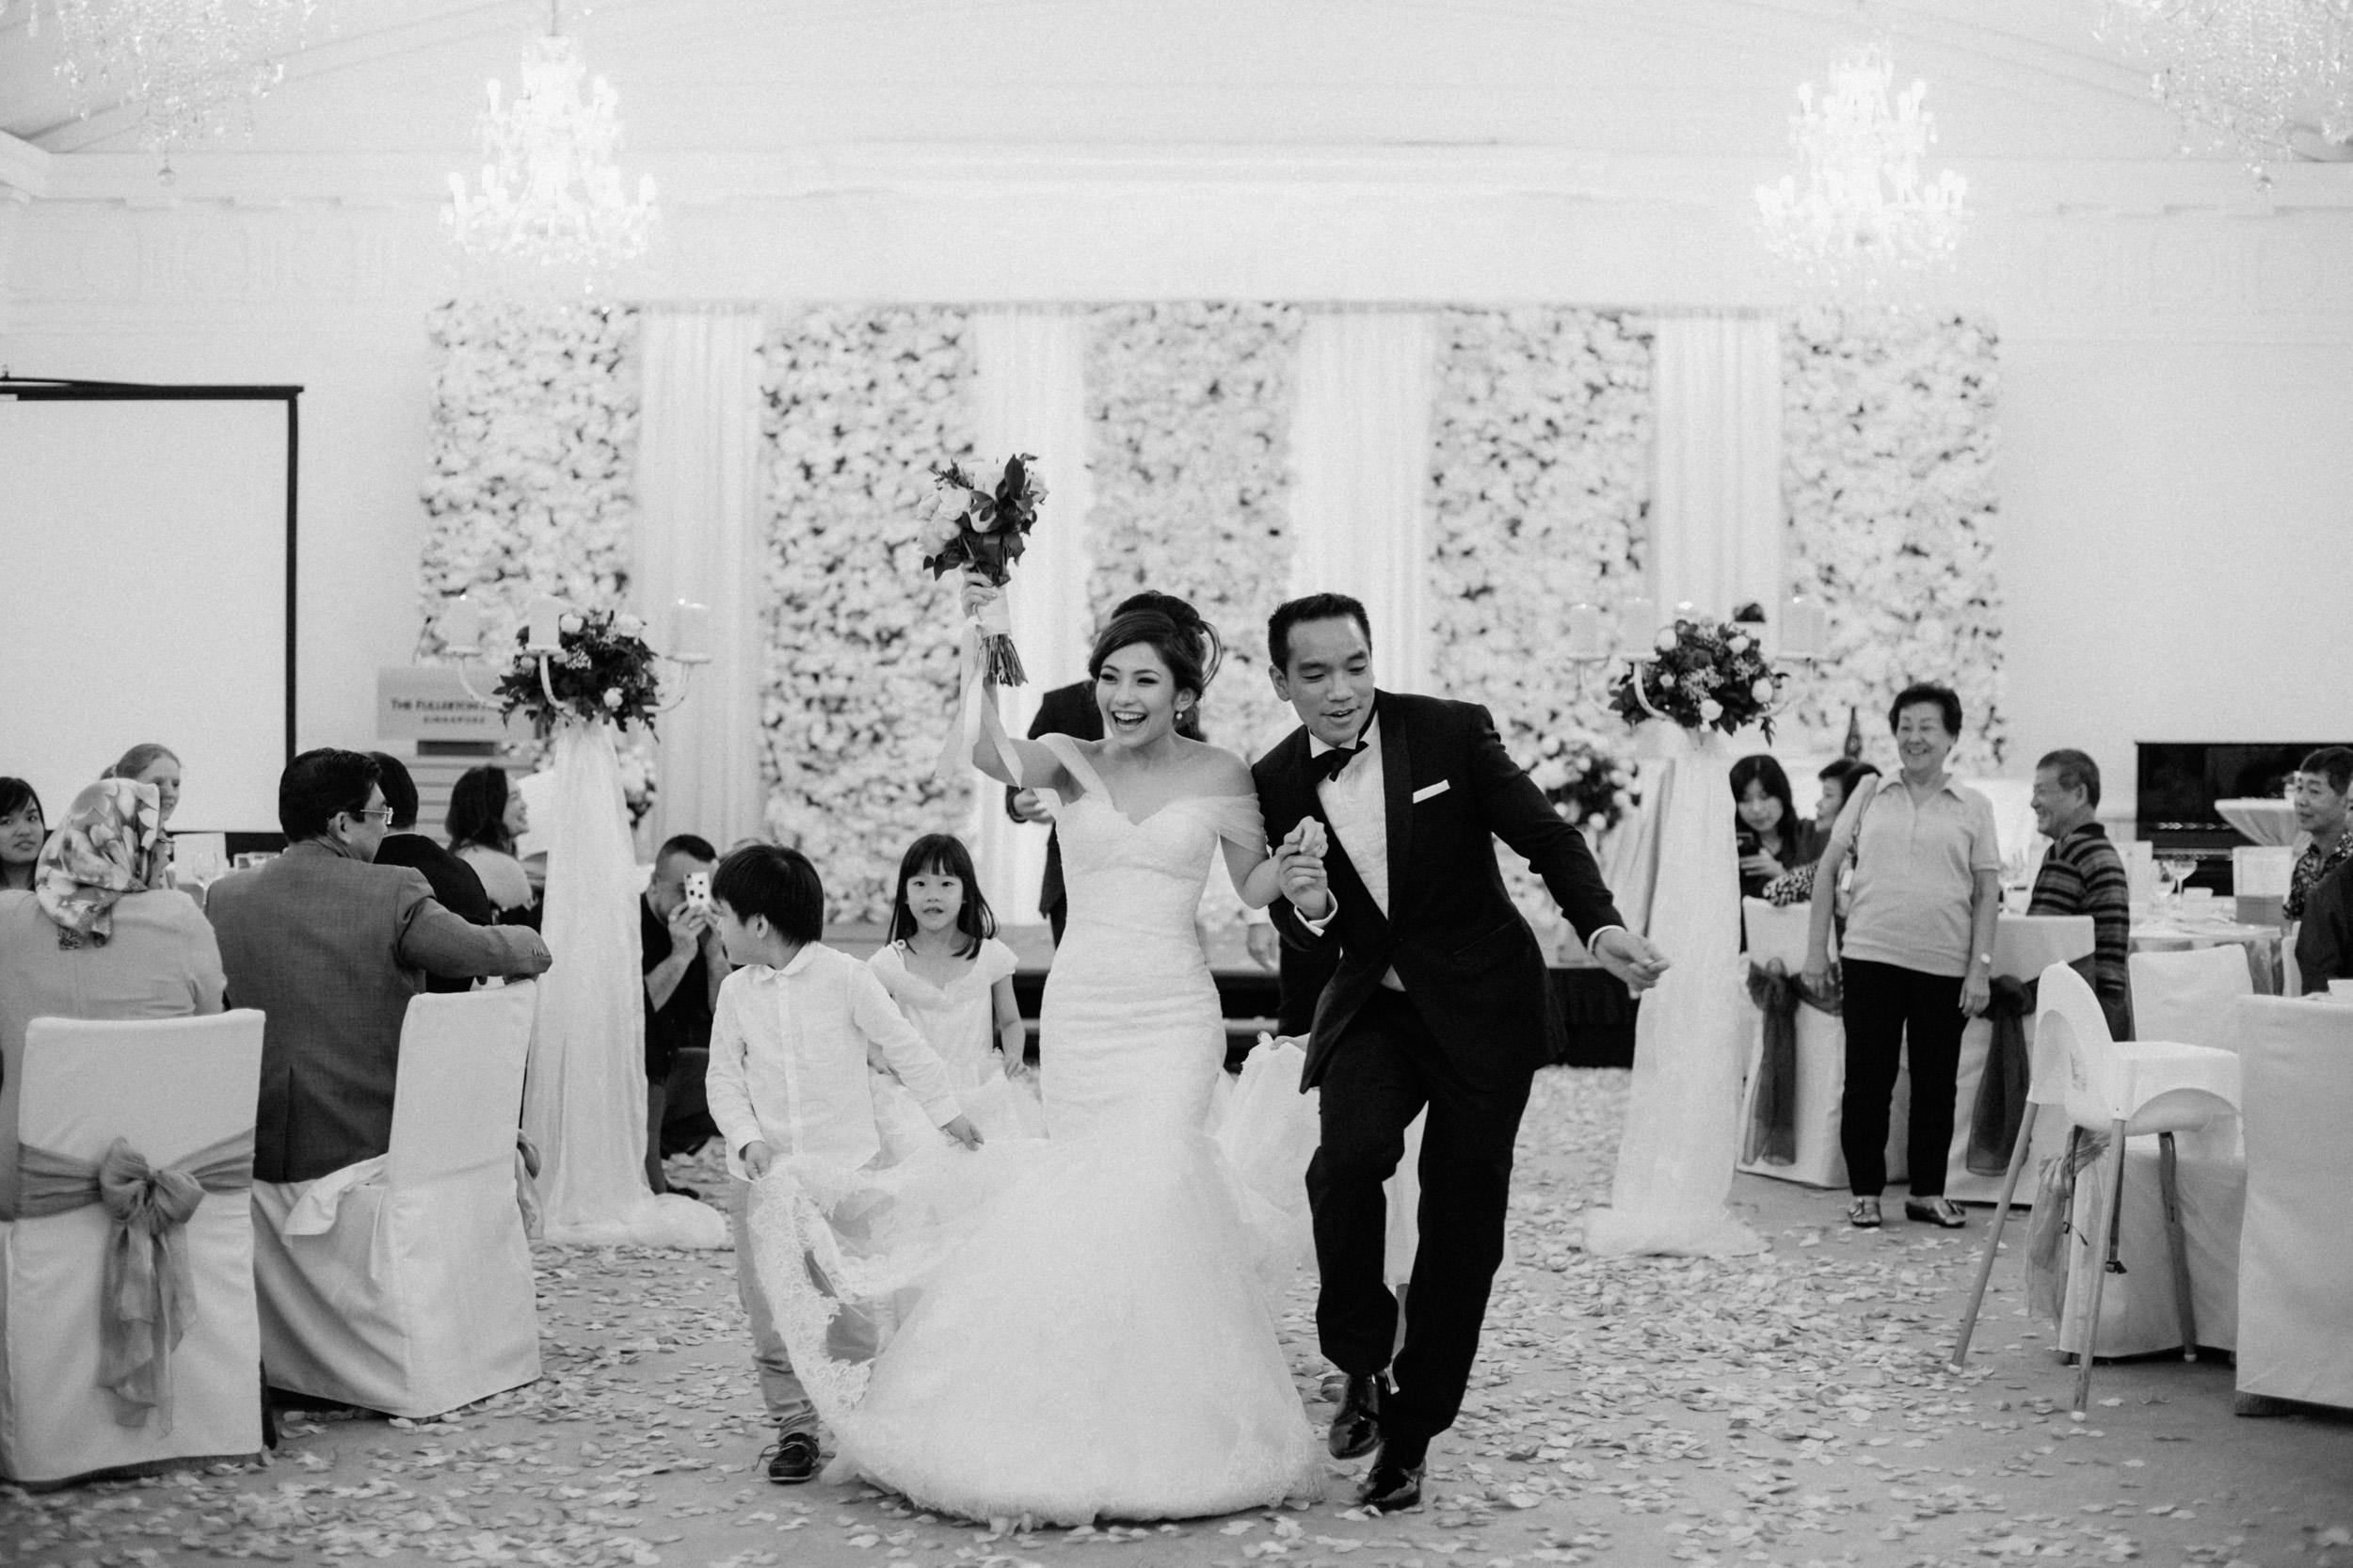 singapore-wedding-photographer-photography-wmt2017-110.jpg